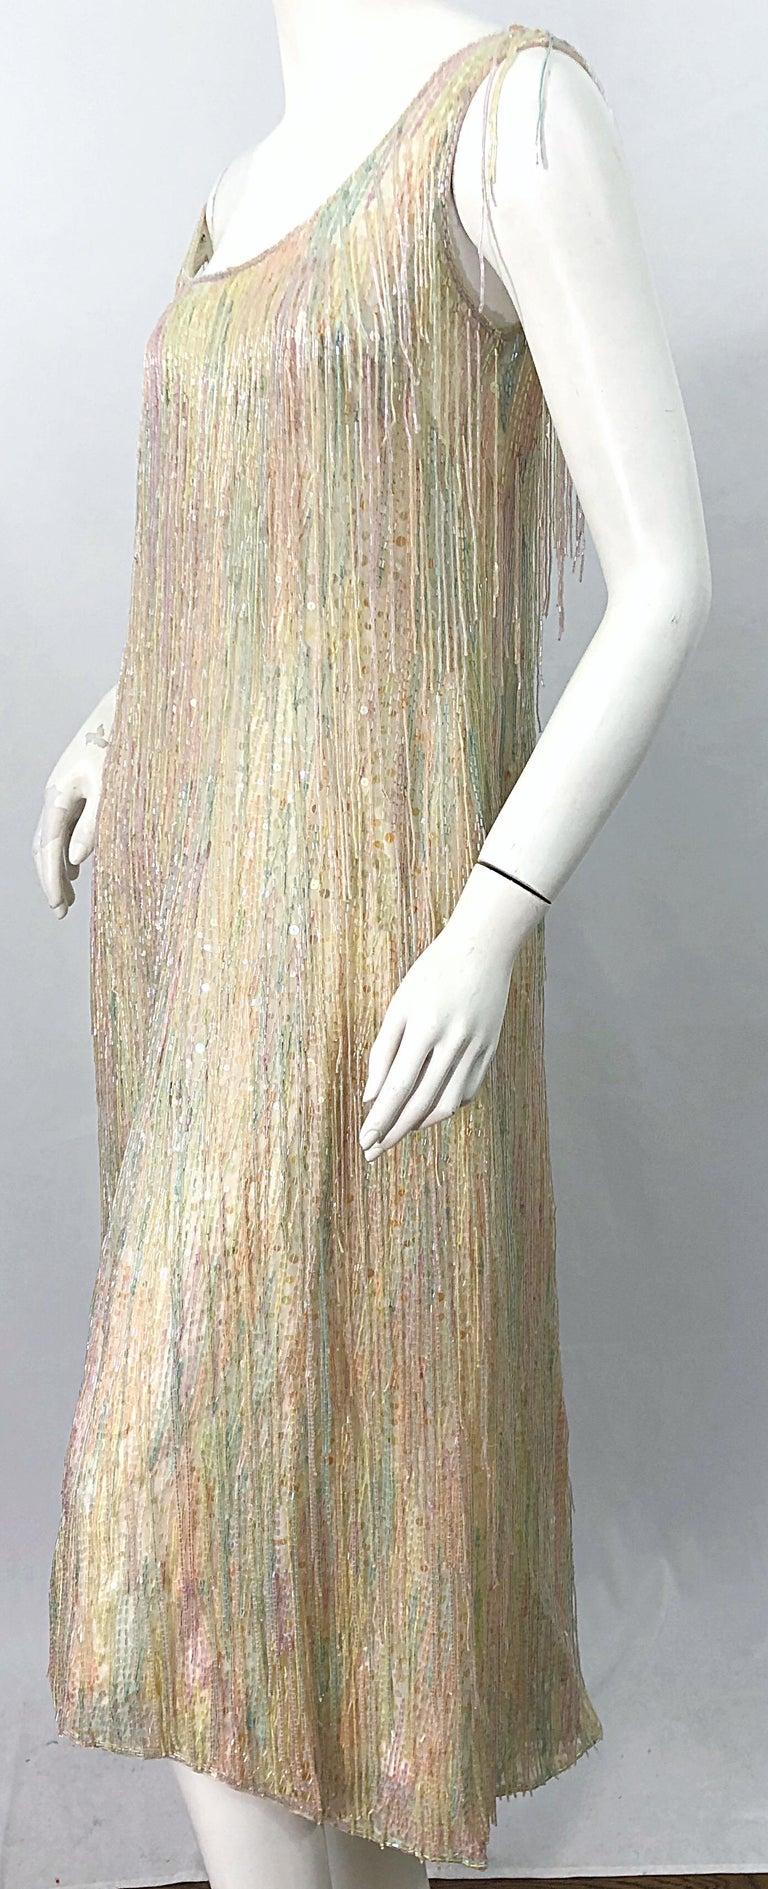 Halston MET Musuem 1970s Fully Fringed Beaded Flapper Style Vintage 70s Dress For Sale 8